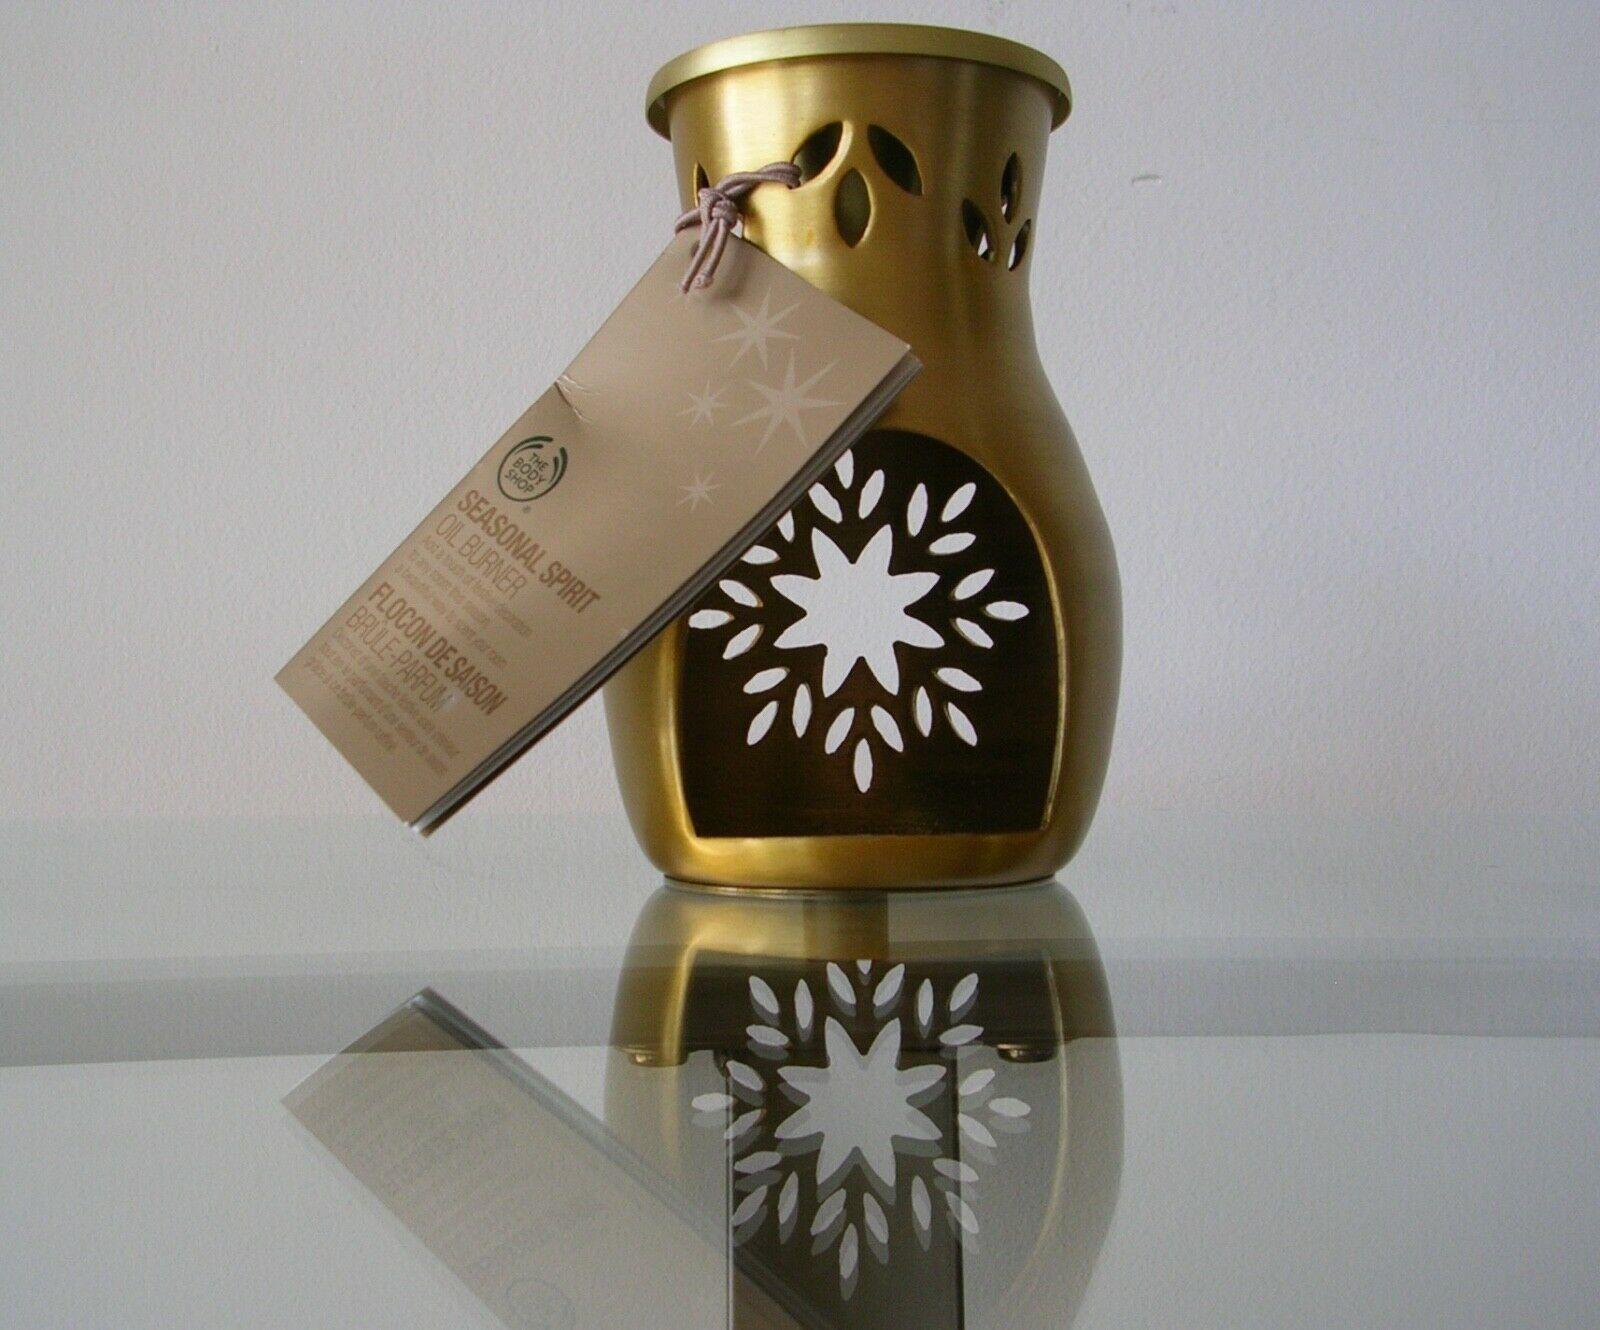 The Body Shop SEASONAL SPIRIT OIL BURNER Warmer Home Fragrance NWT New With Tag - $25.43